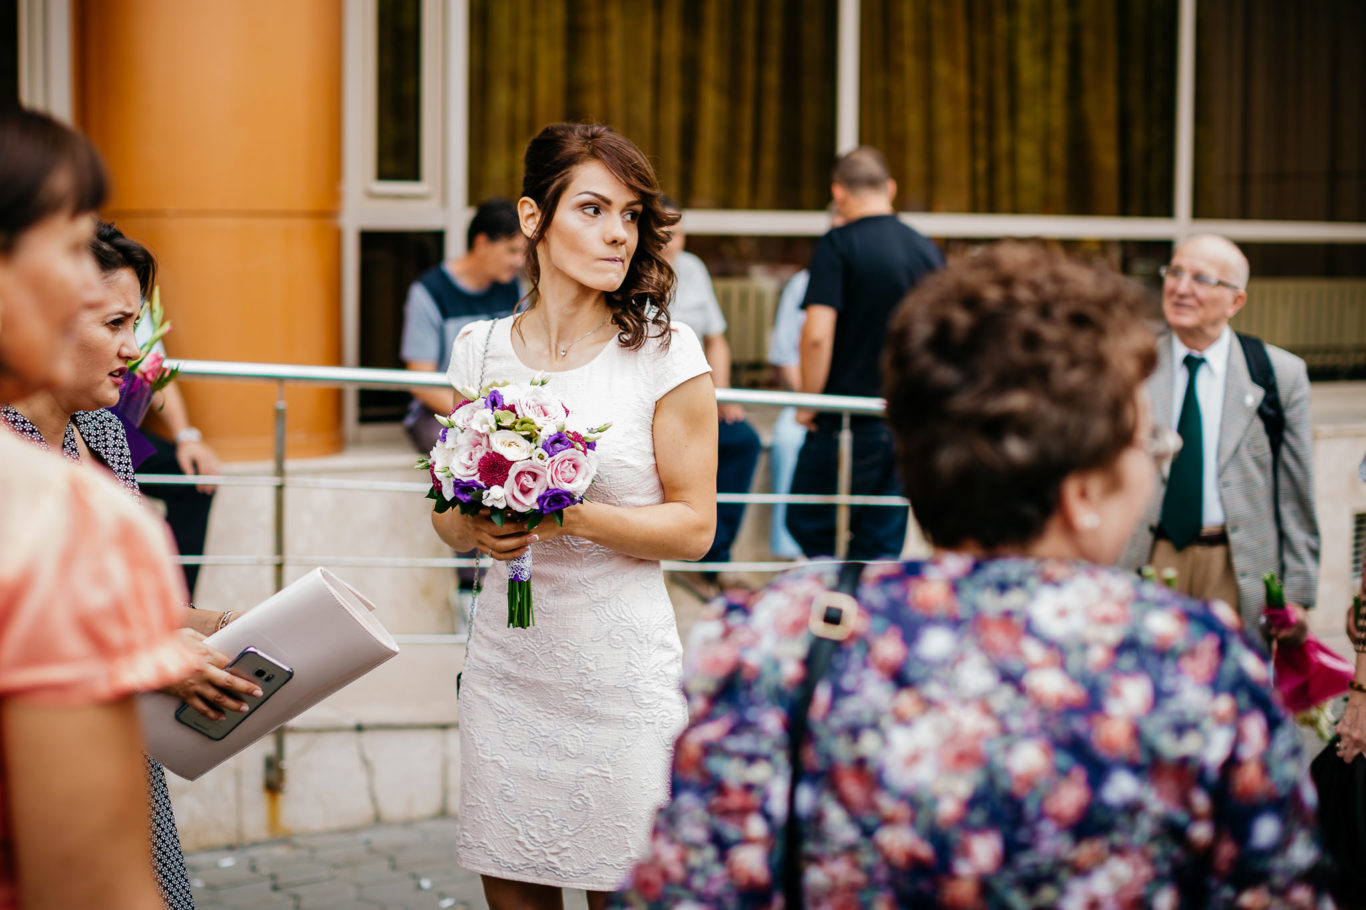 0029-fotografie-nunta-bucuresti-dana-radu-fotograf-ciprian-dumitrescu-cd2_6073